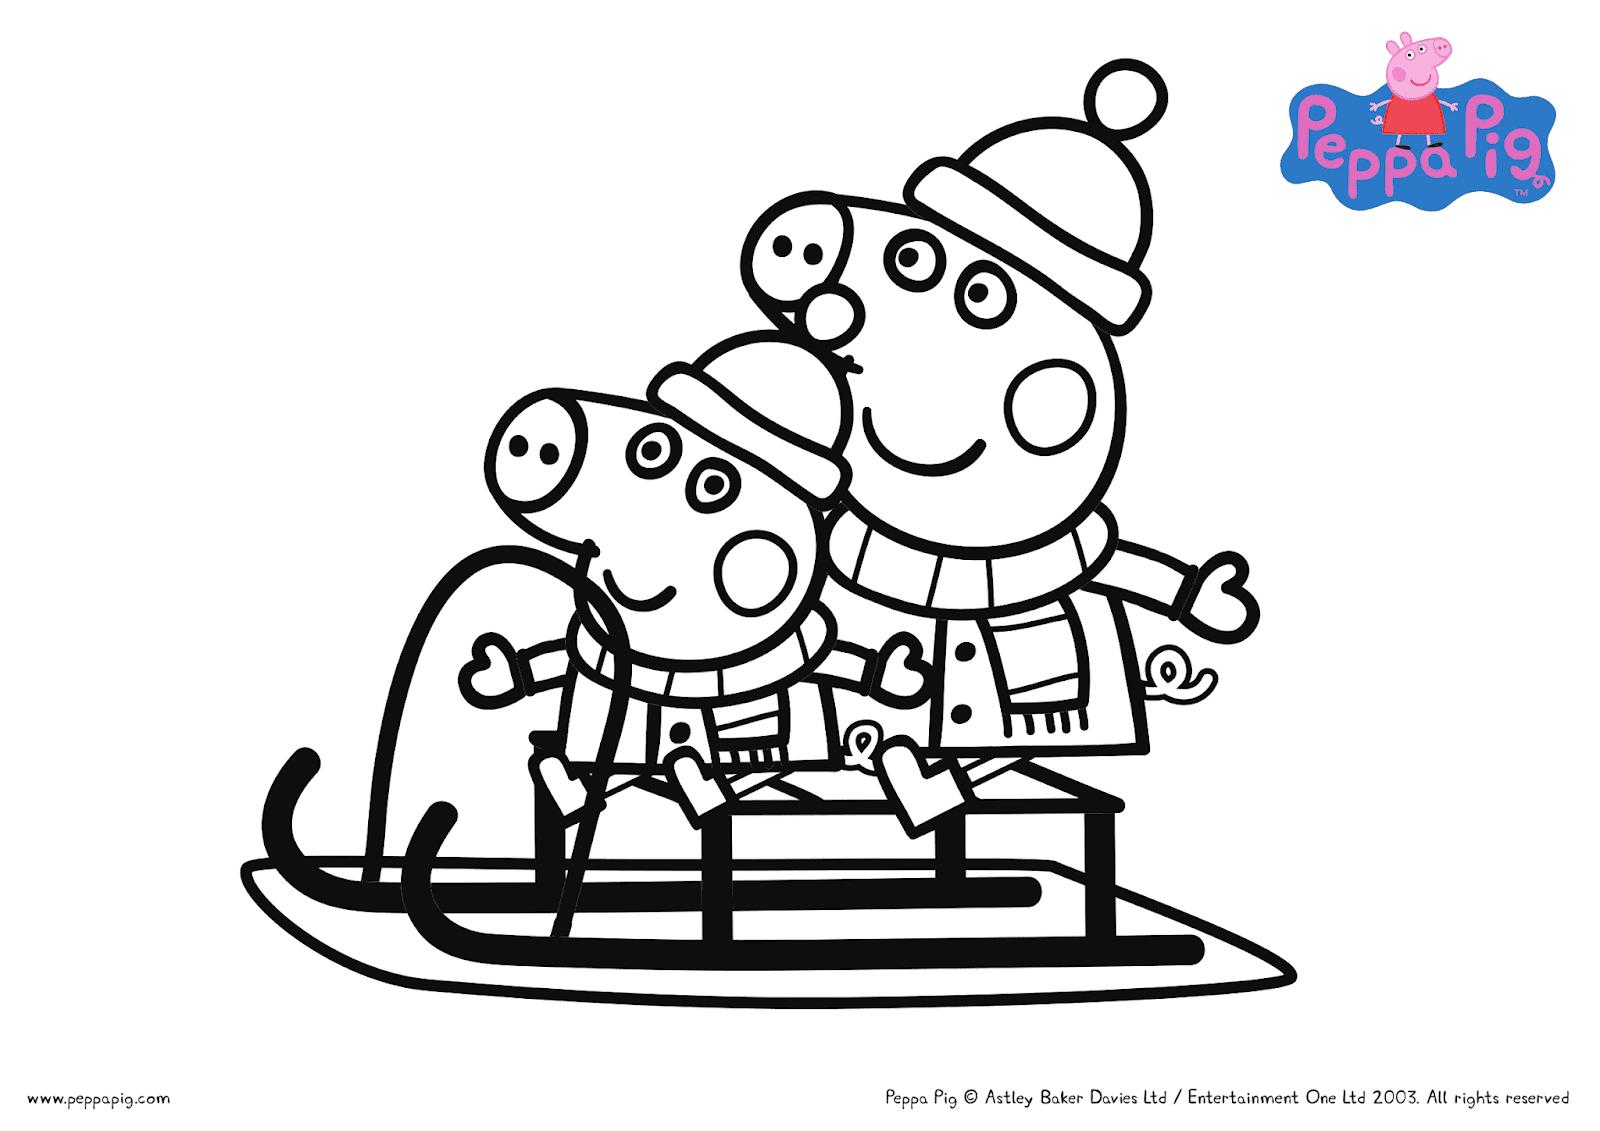 Christmas with Peppa Pig FREE Printable Coloring Sheets